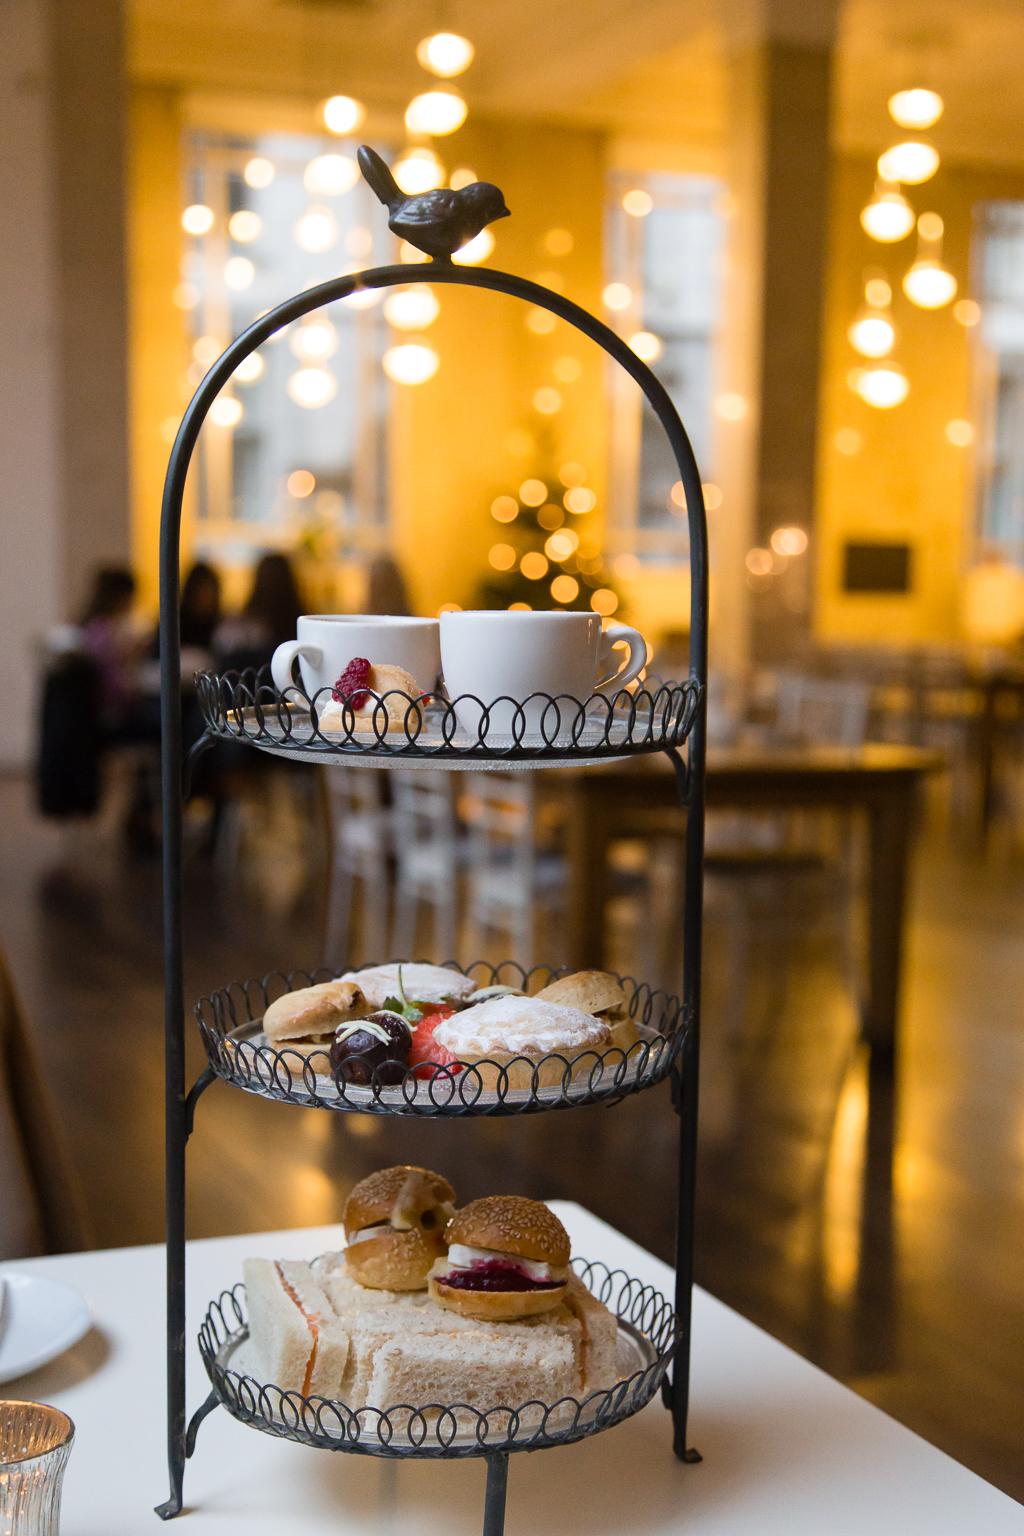 Afternoon Tea Platter, Liverpool